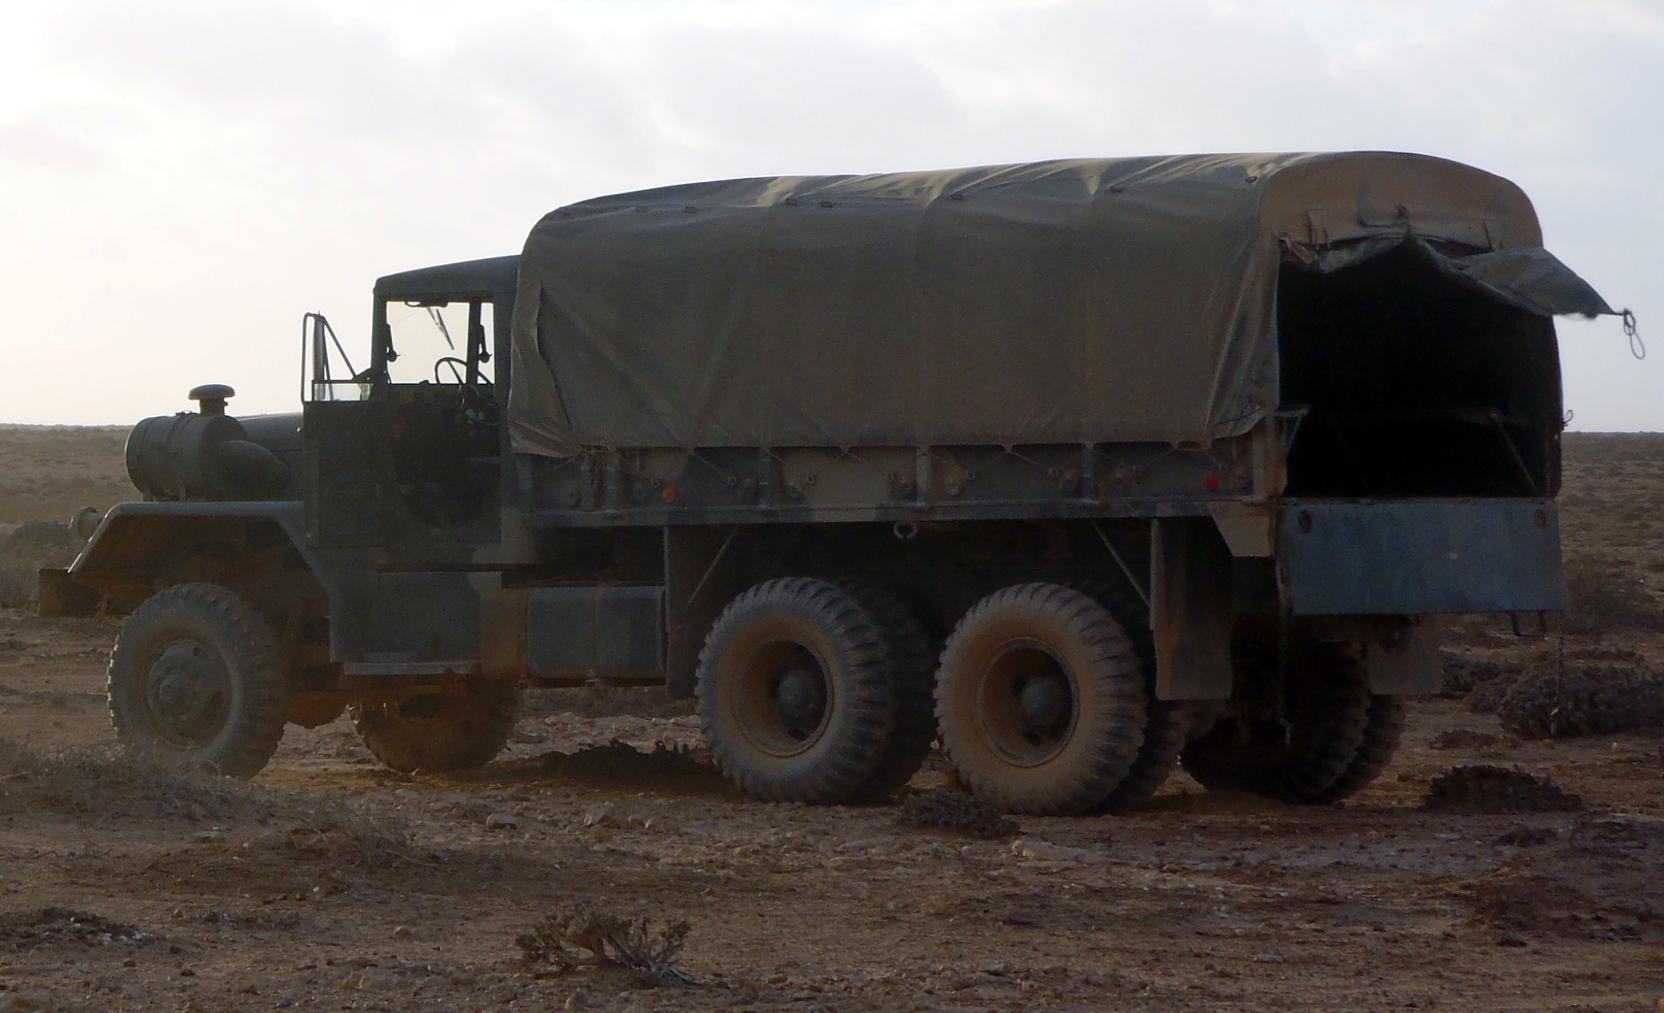 Photos - Logistique et Camions / Logistics and Trucks - Page 5 32511392240_75bb6d84e0_o